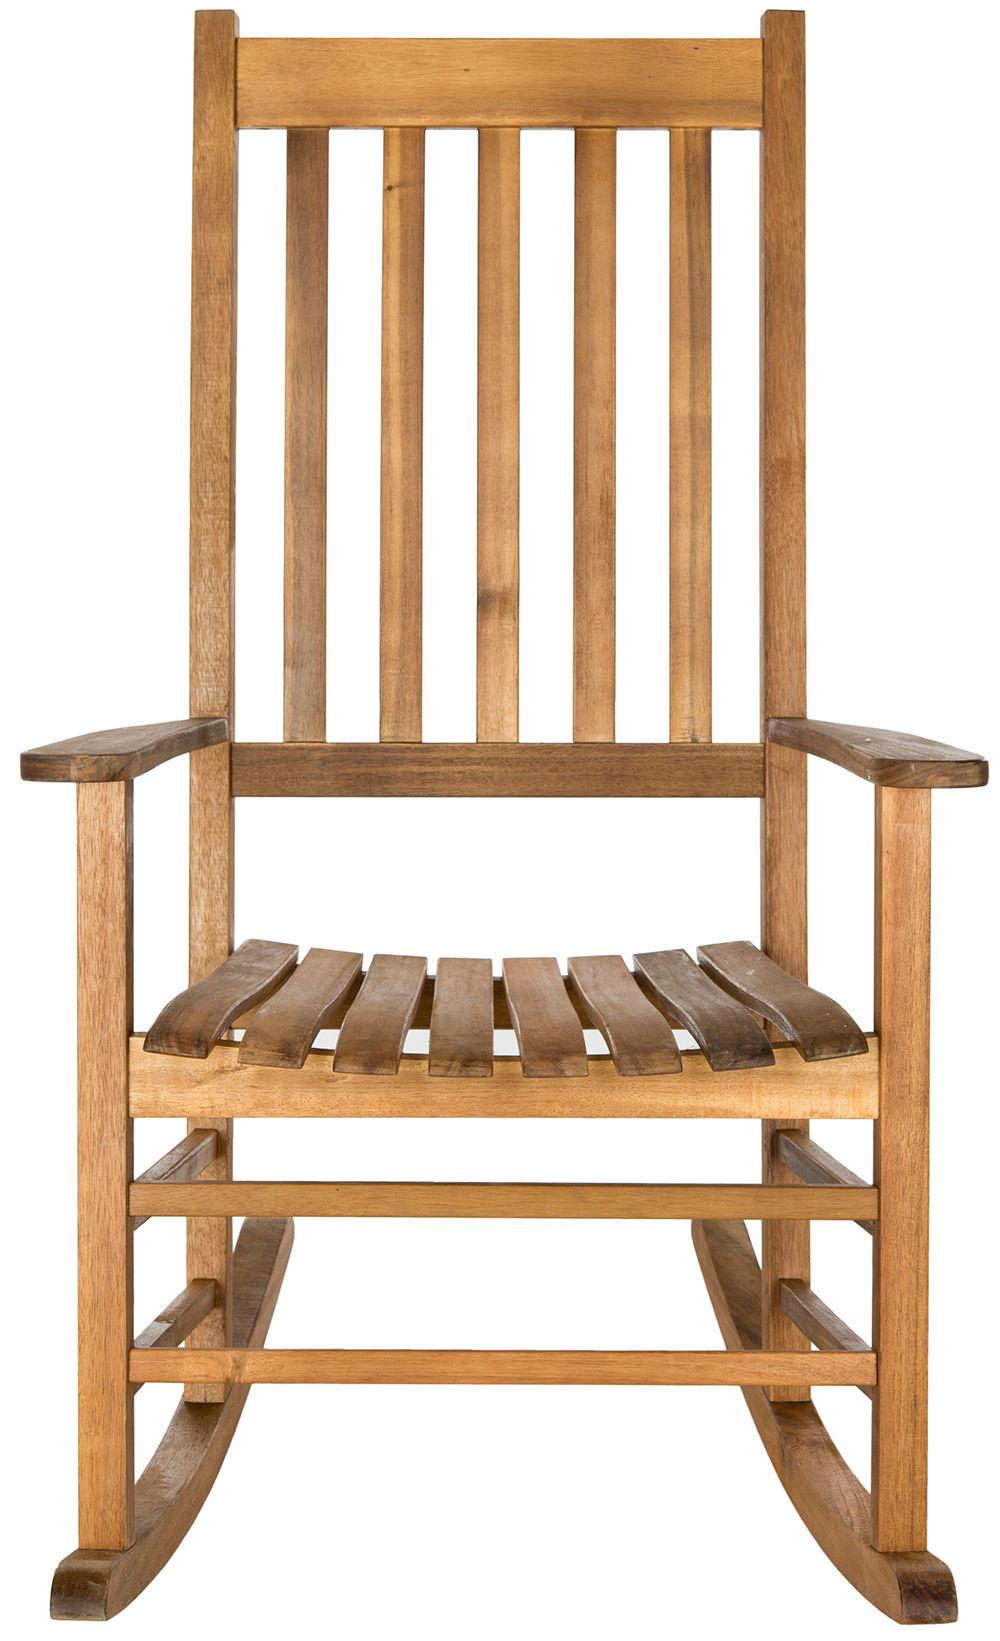 Sensational Safavieh Pat7002 Lamtechconsult Wood Chair Design Ideas Lamtechconsultcom